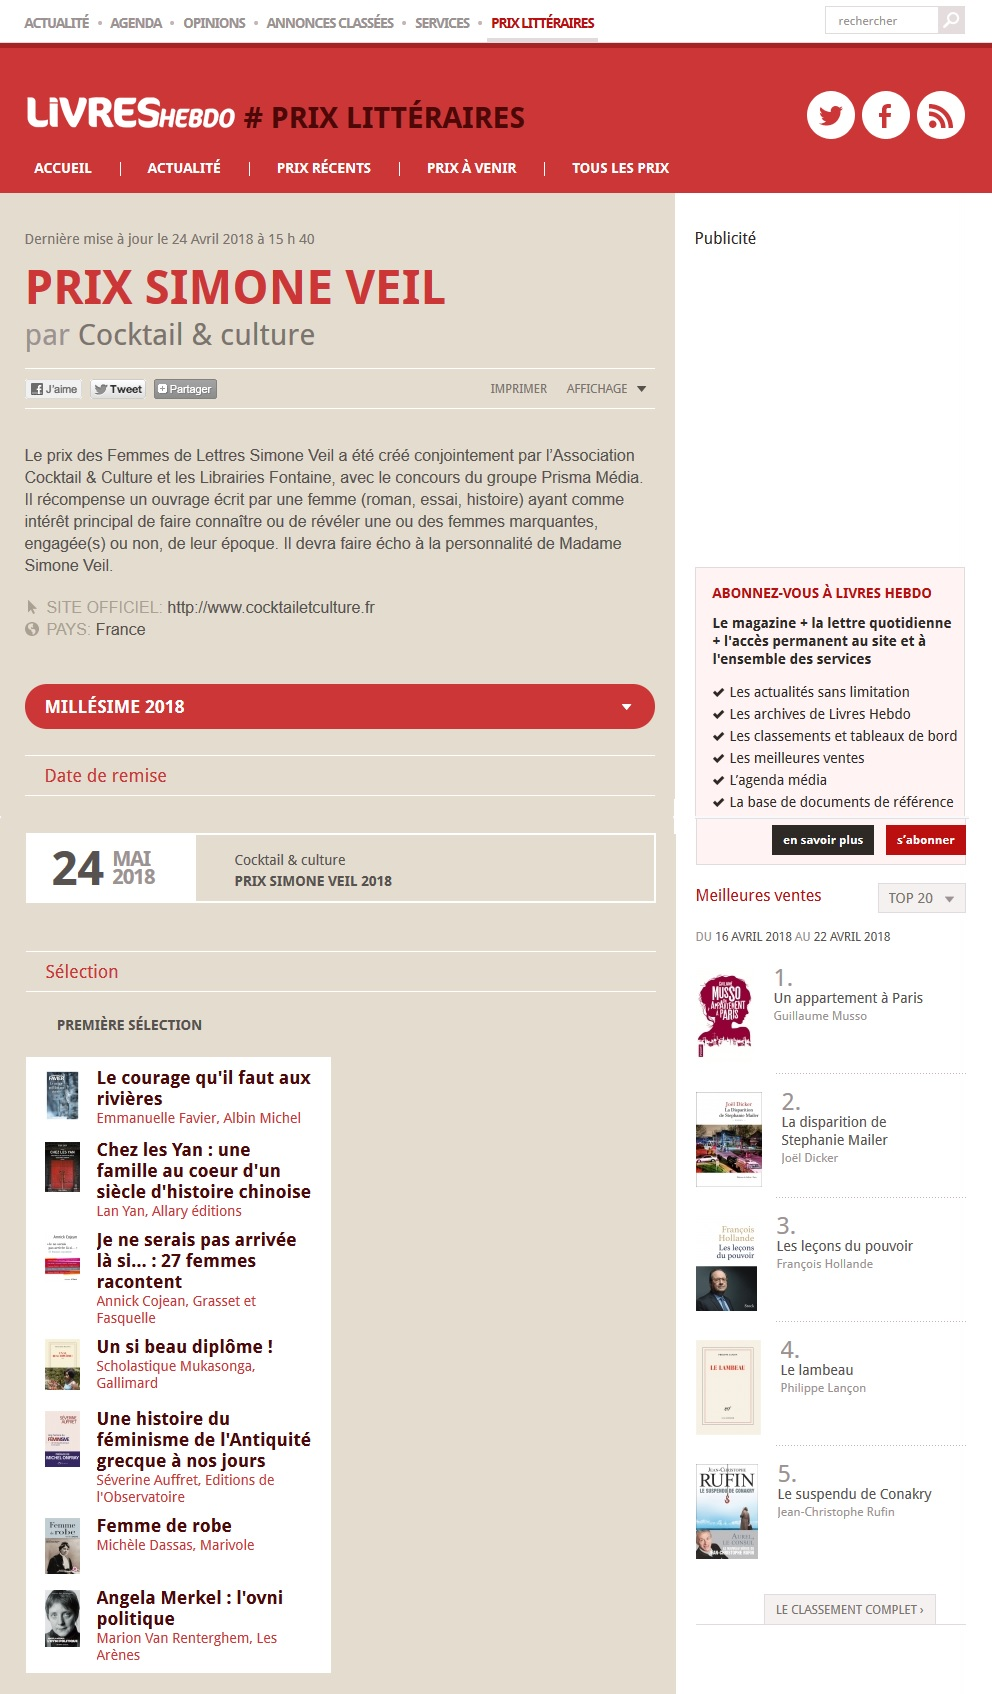 Article Livres Hebdo Finalistes Prix Simone Veil 2018